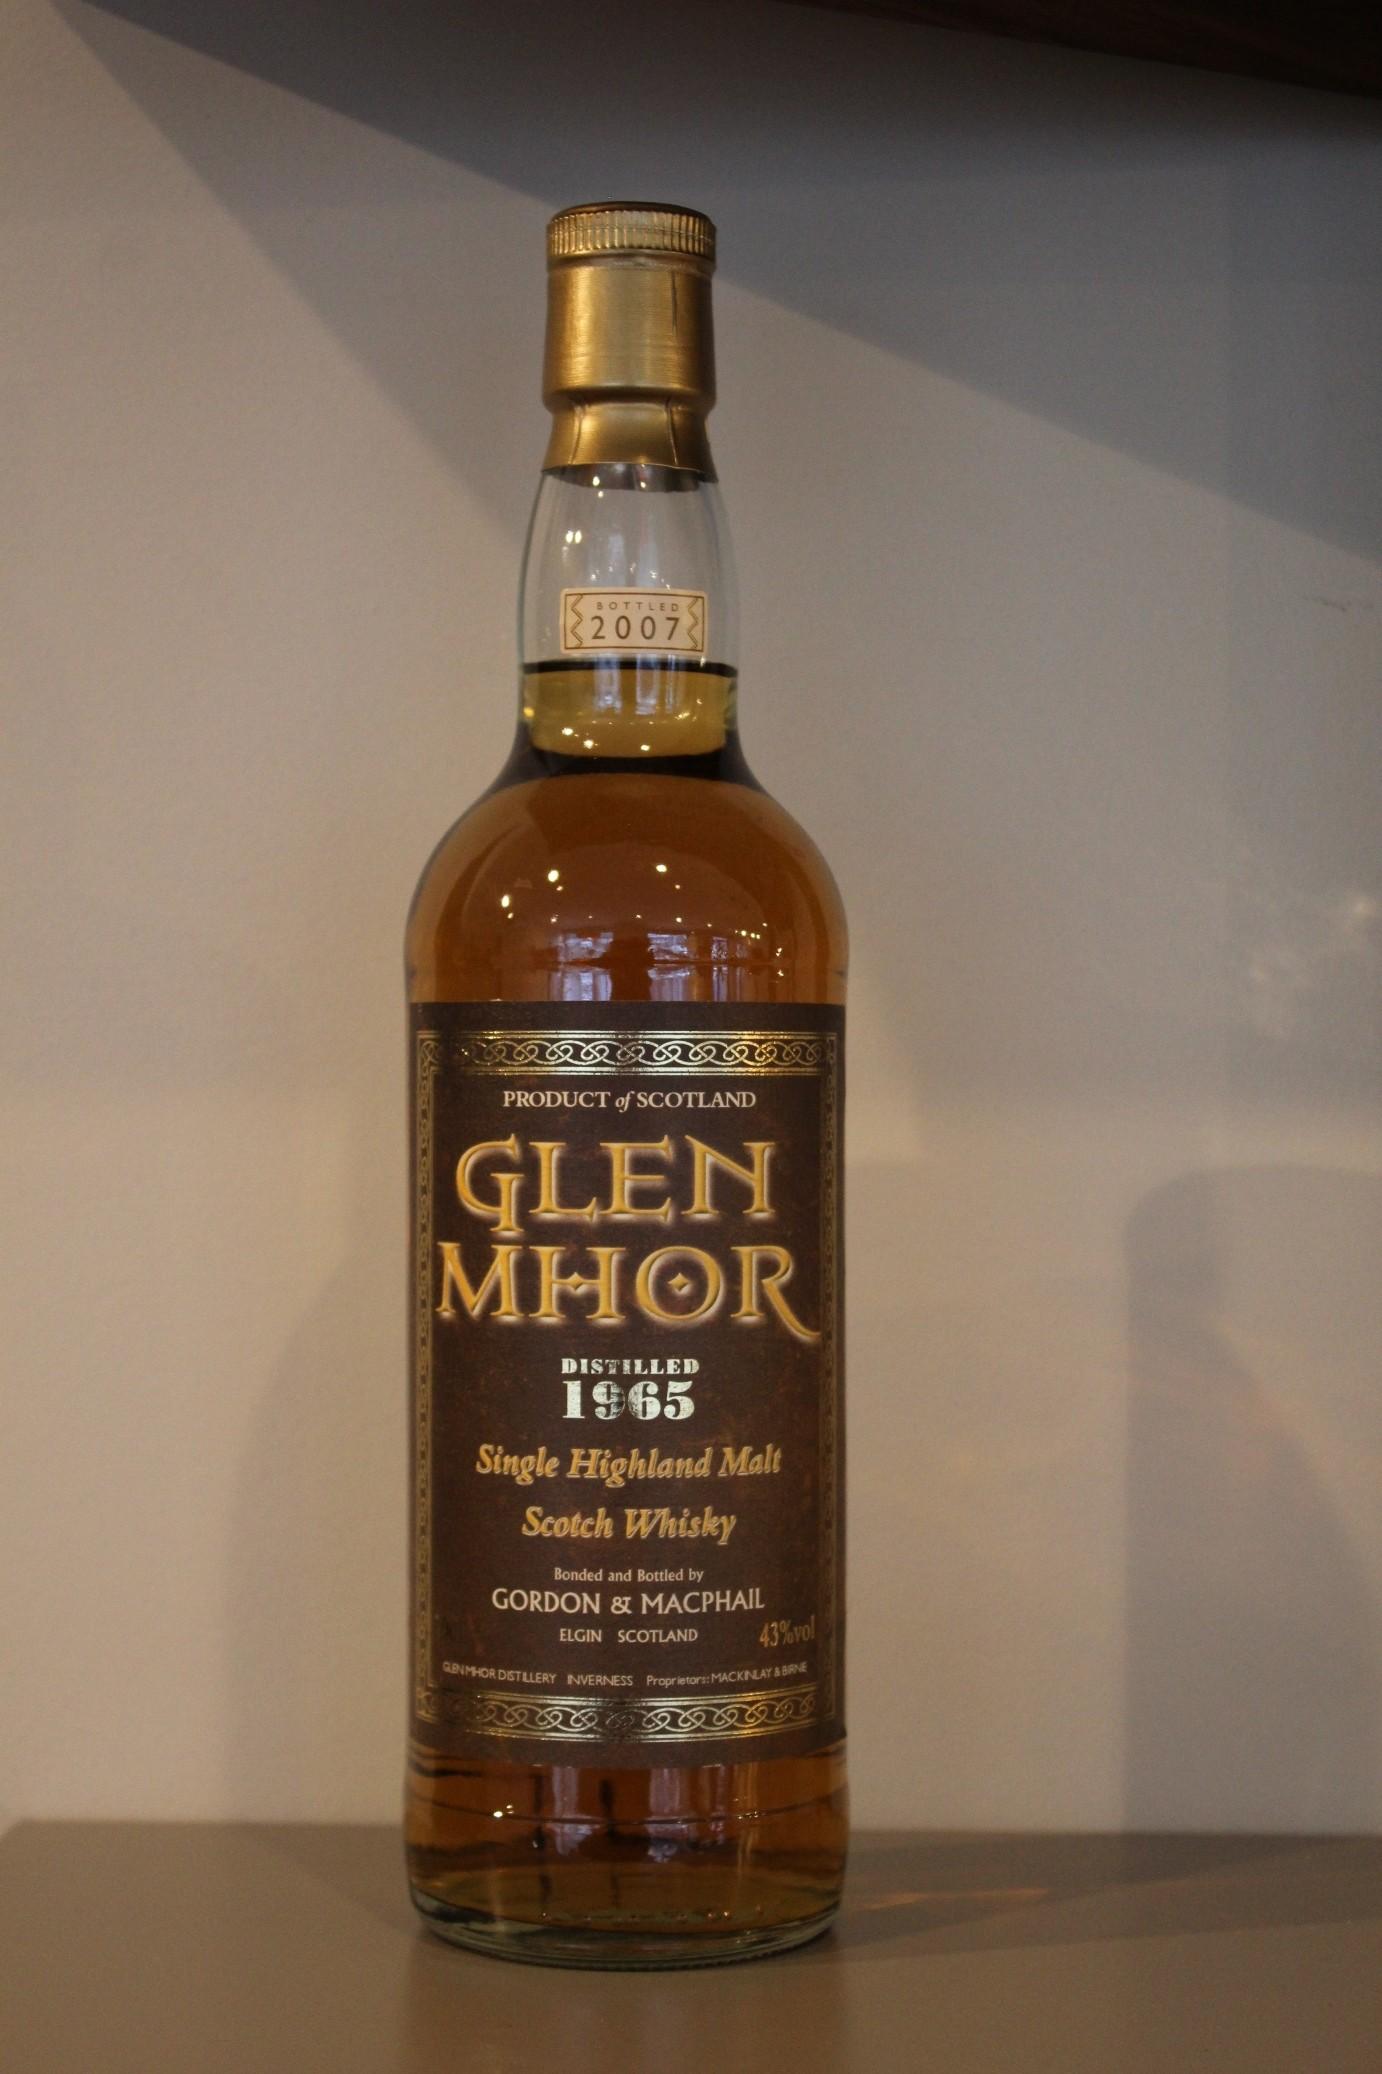 GLEN MHOR 1965 GORDON & MACPHAIL / SCOTLAND